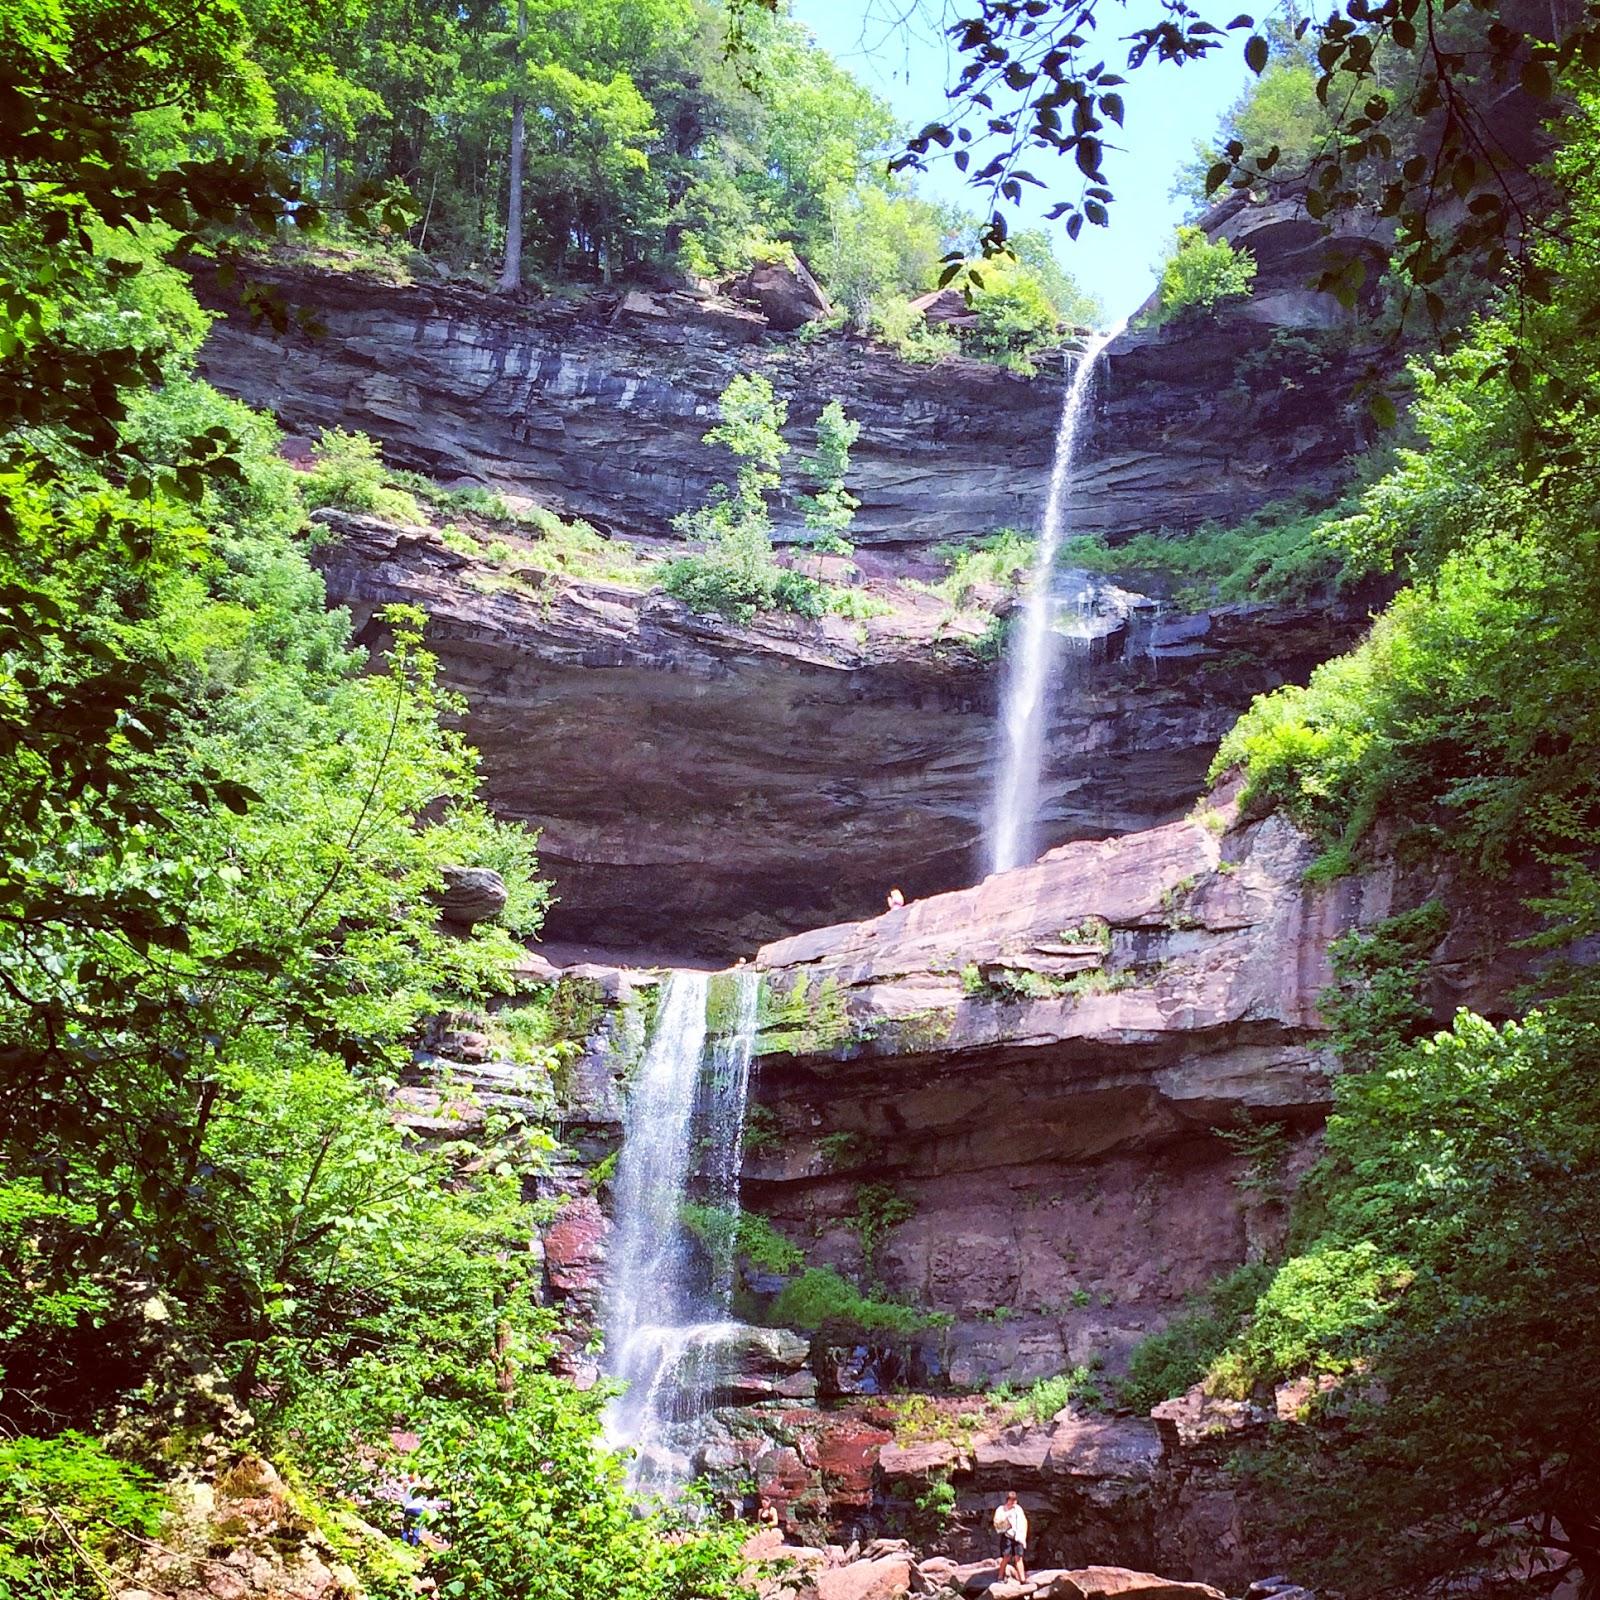 Warriors Path State Park Map: Catskill Trails, Catskill Hikes